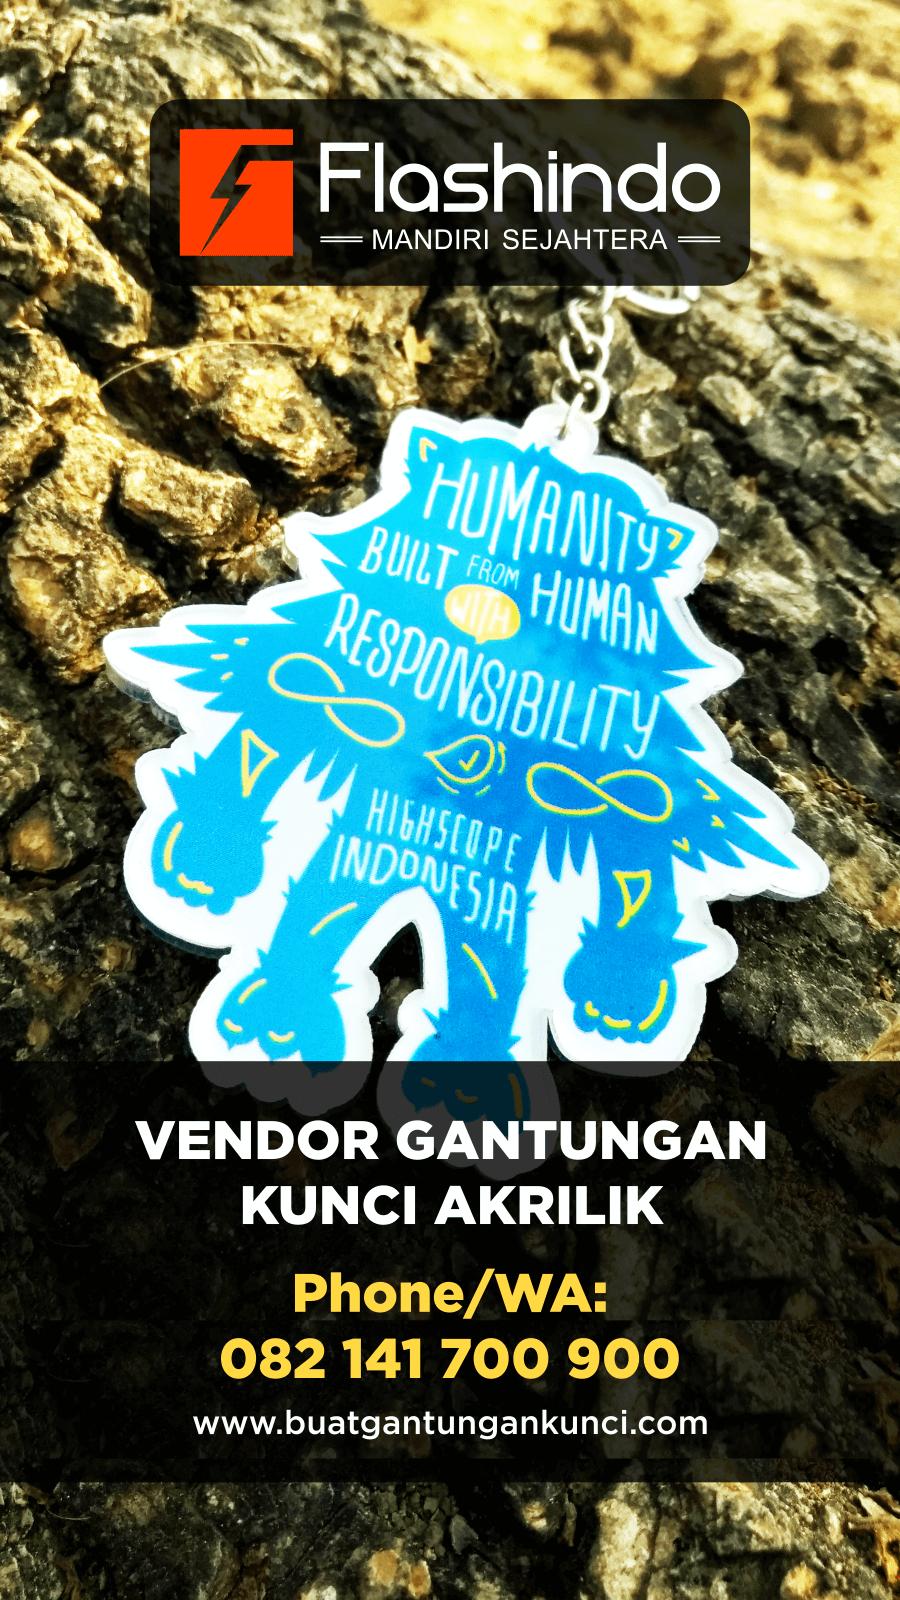 Gantungan kunci humanity built from human responsibility